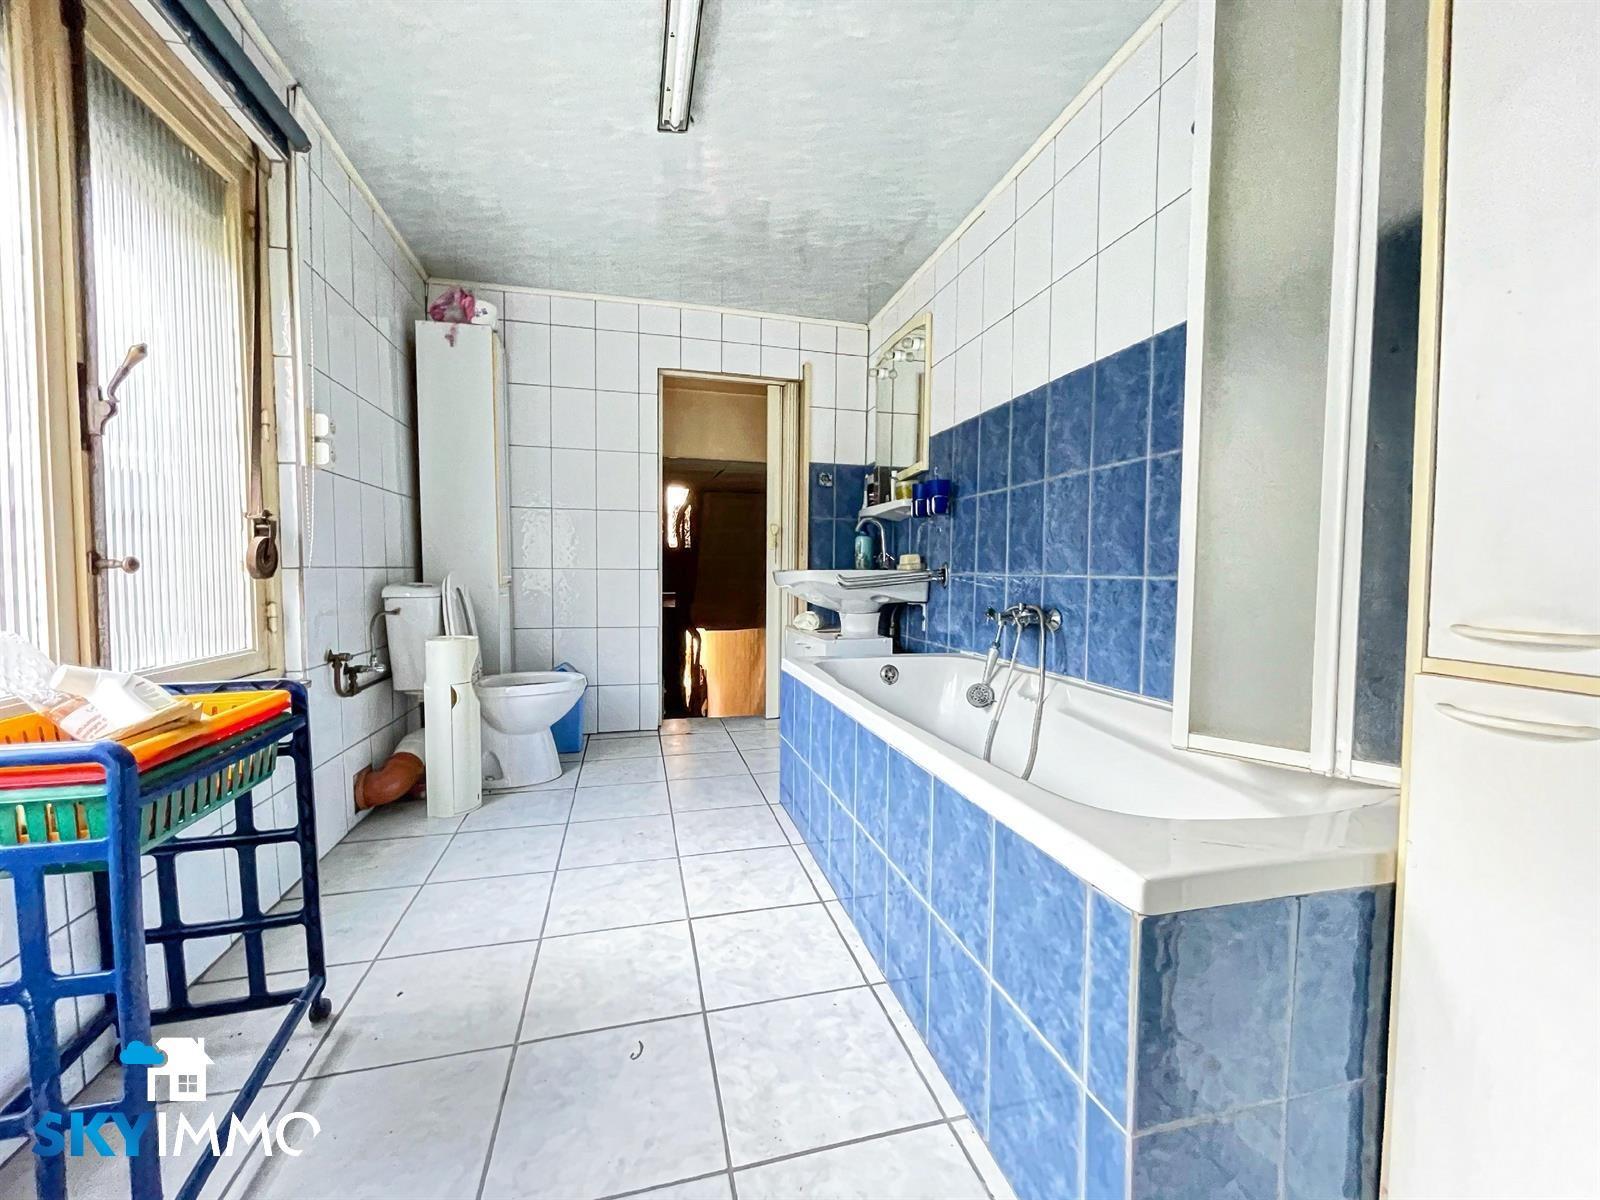 Maison - Seraing Jemeppesur-Meuse - #4383857-17